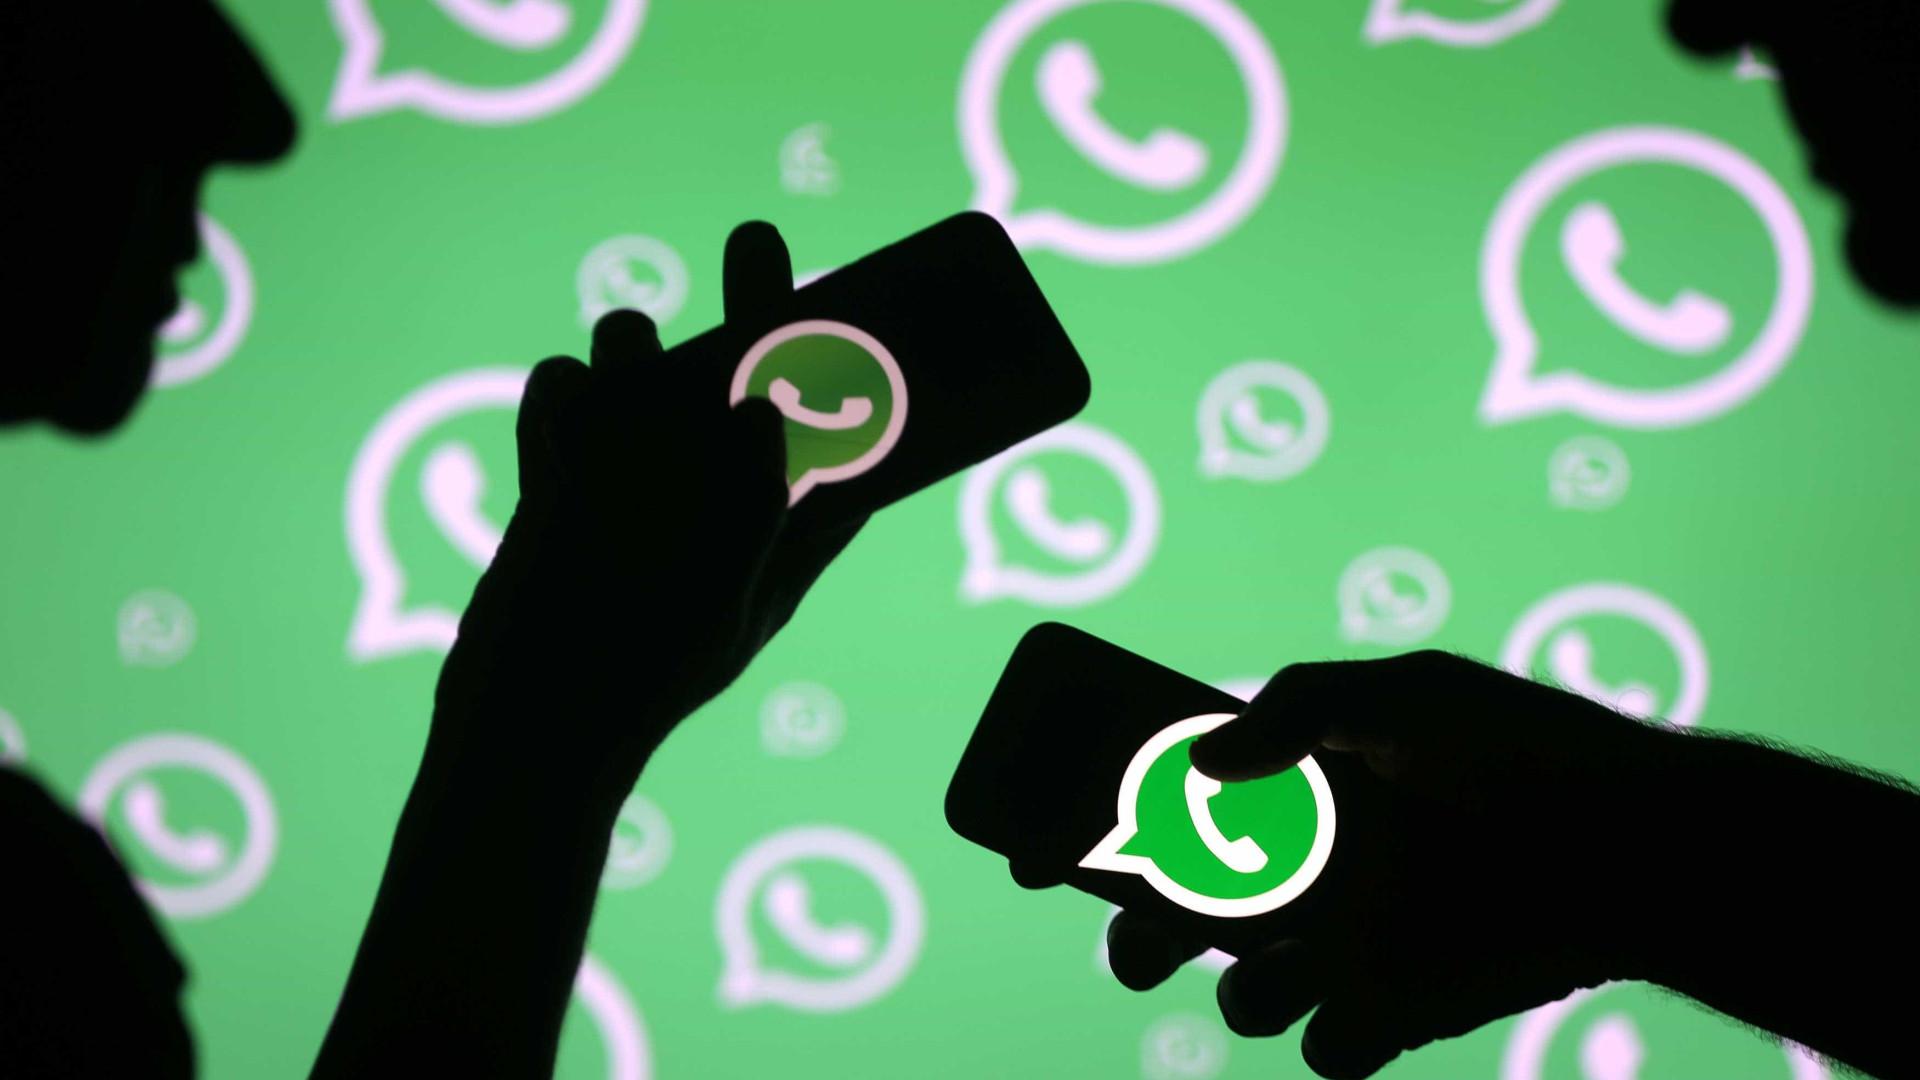 WhatsApp permite ouvir áudios antes do envio